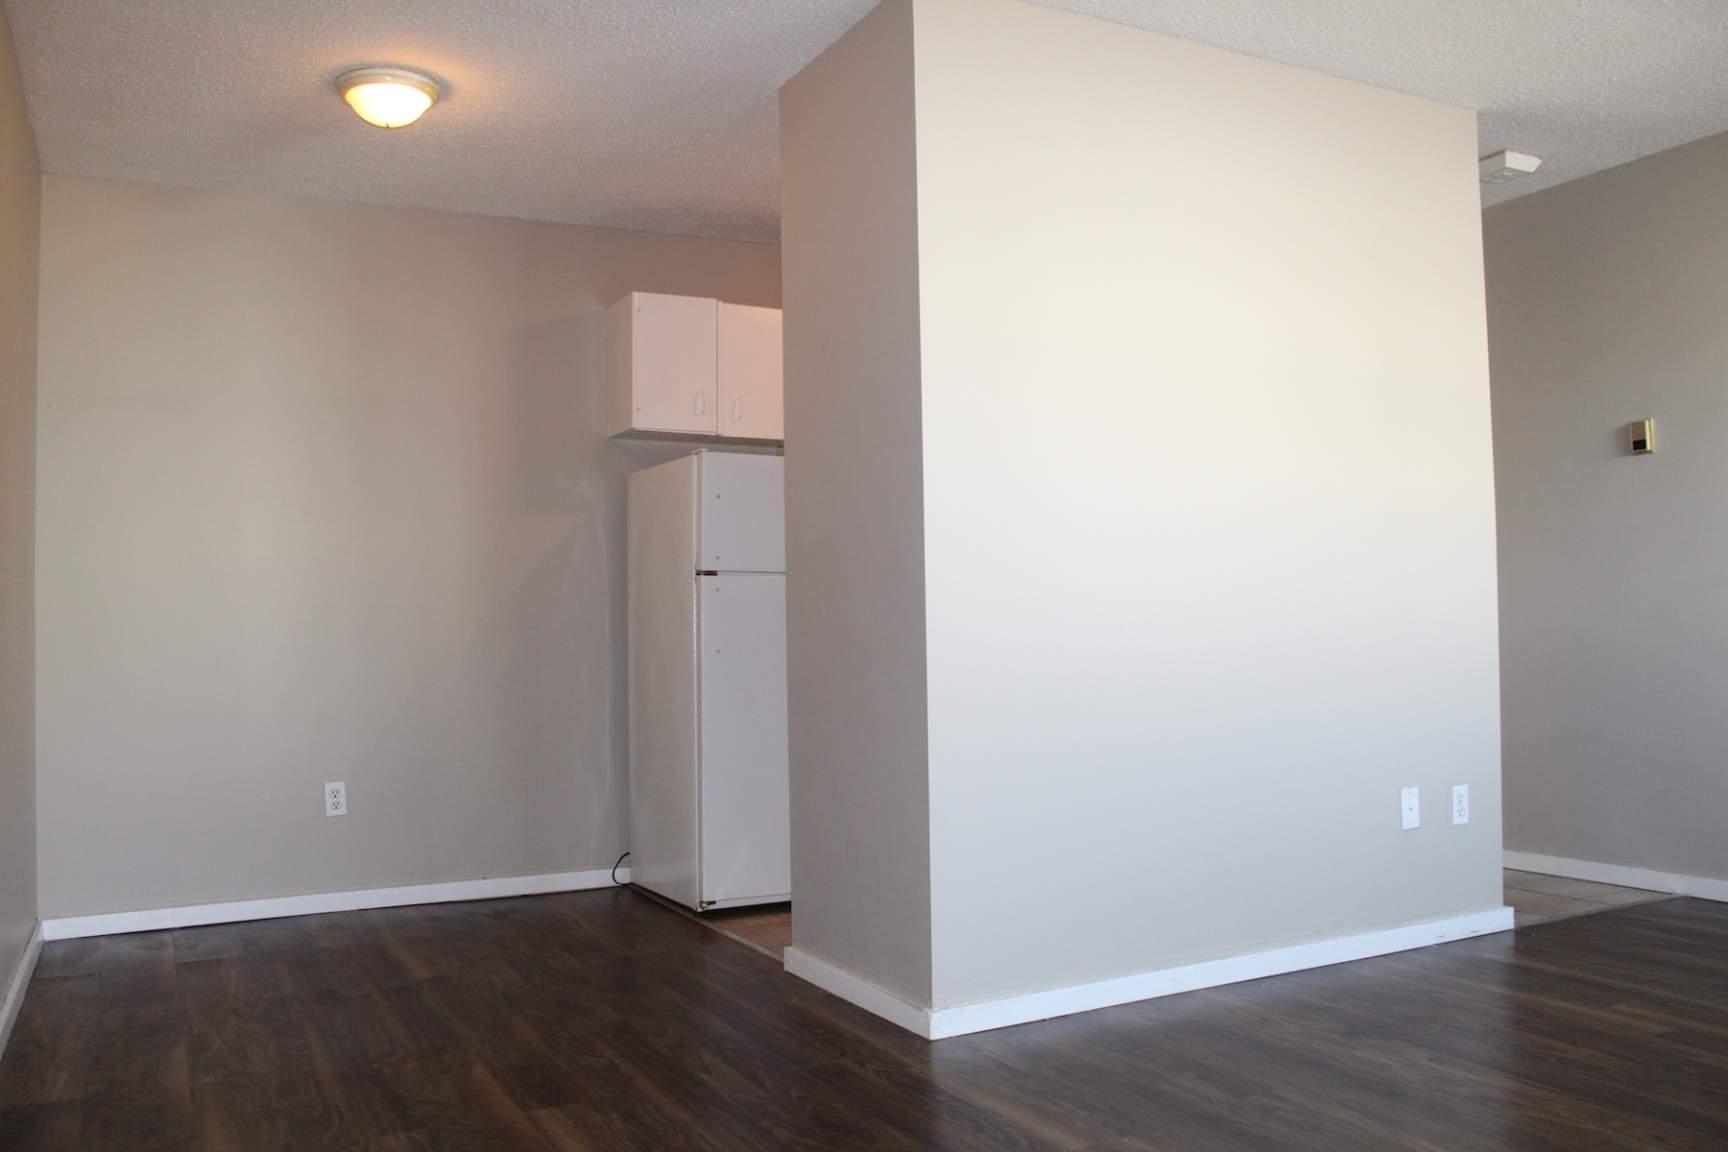 1612 24 Avenue SW, Calgary, AB - $999